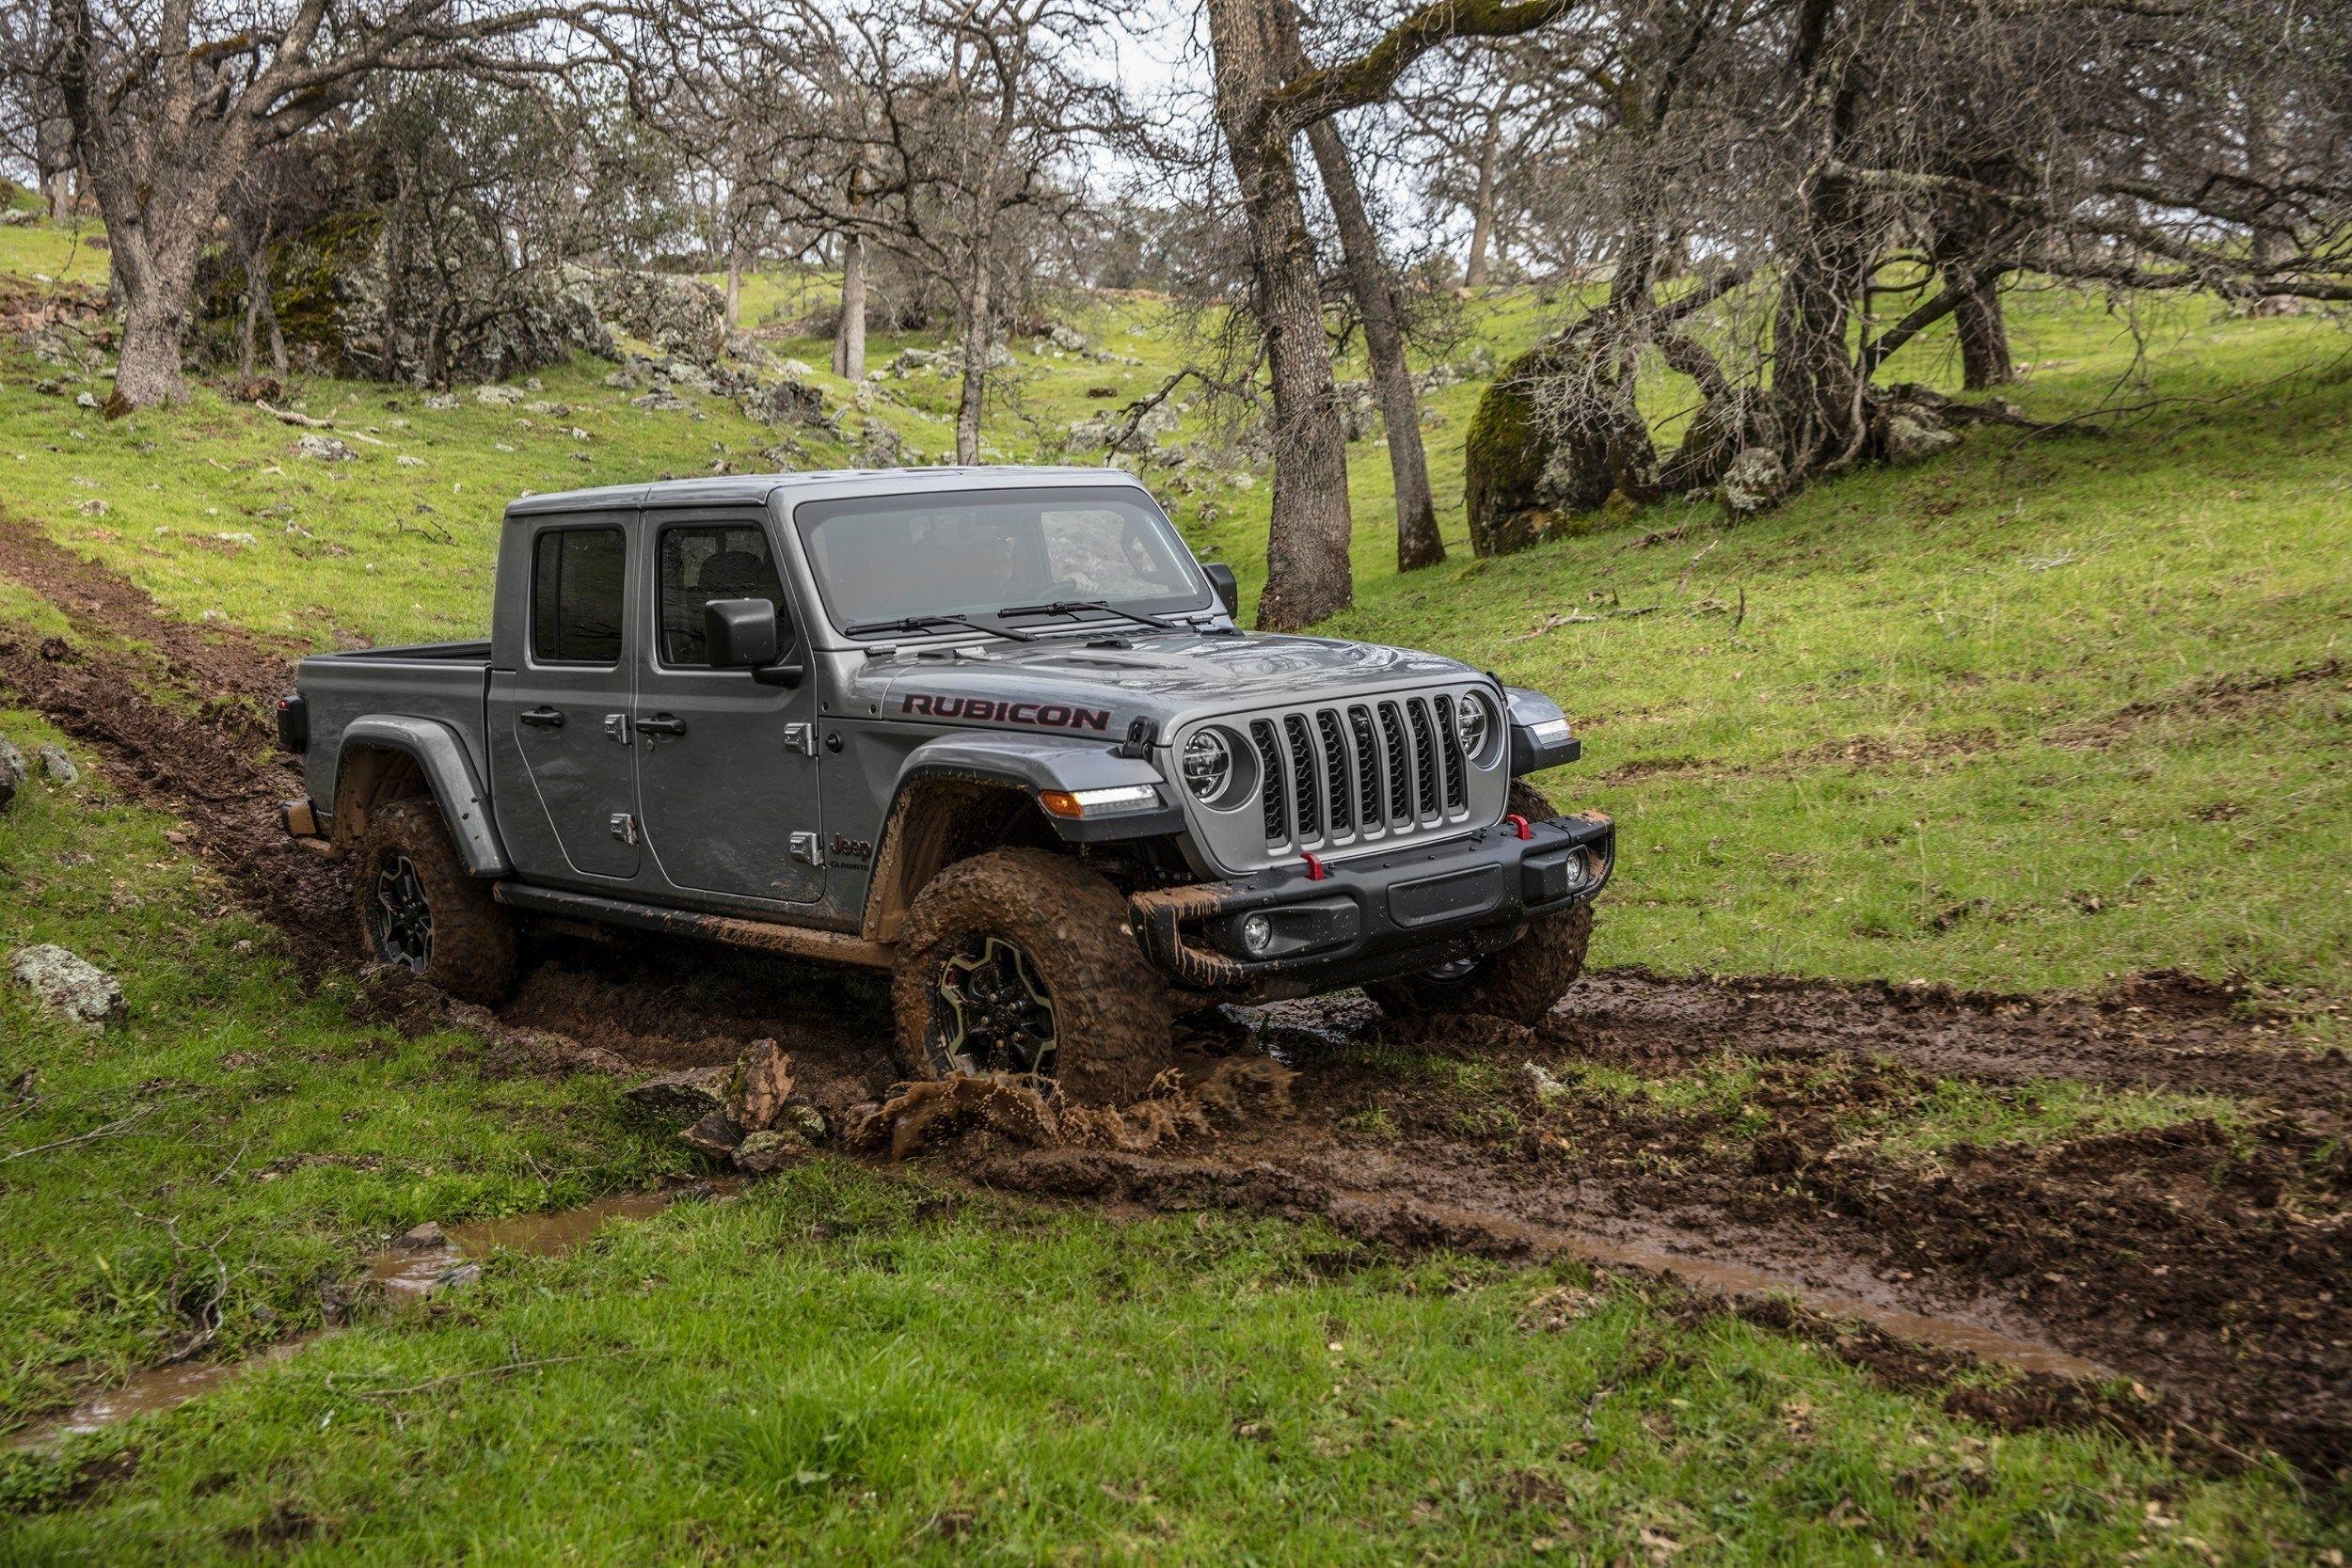 Jeep Rubicon 2020 Price Gas Mileage Jeep Gladiator Jeep Wrangler Jeep Pickup